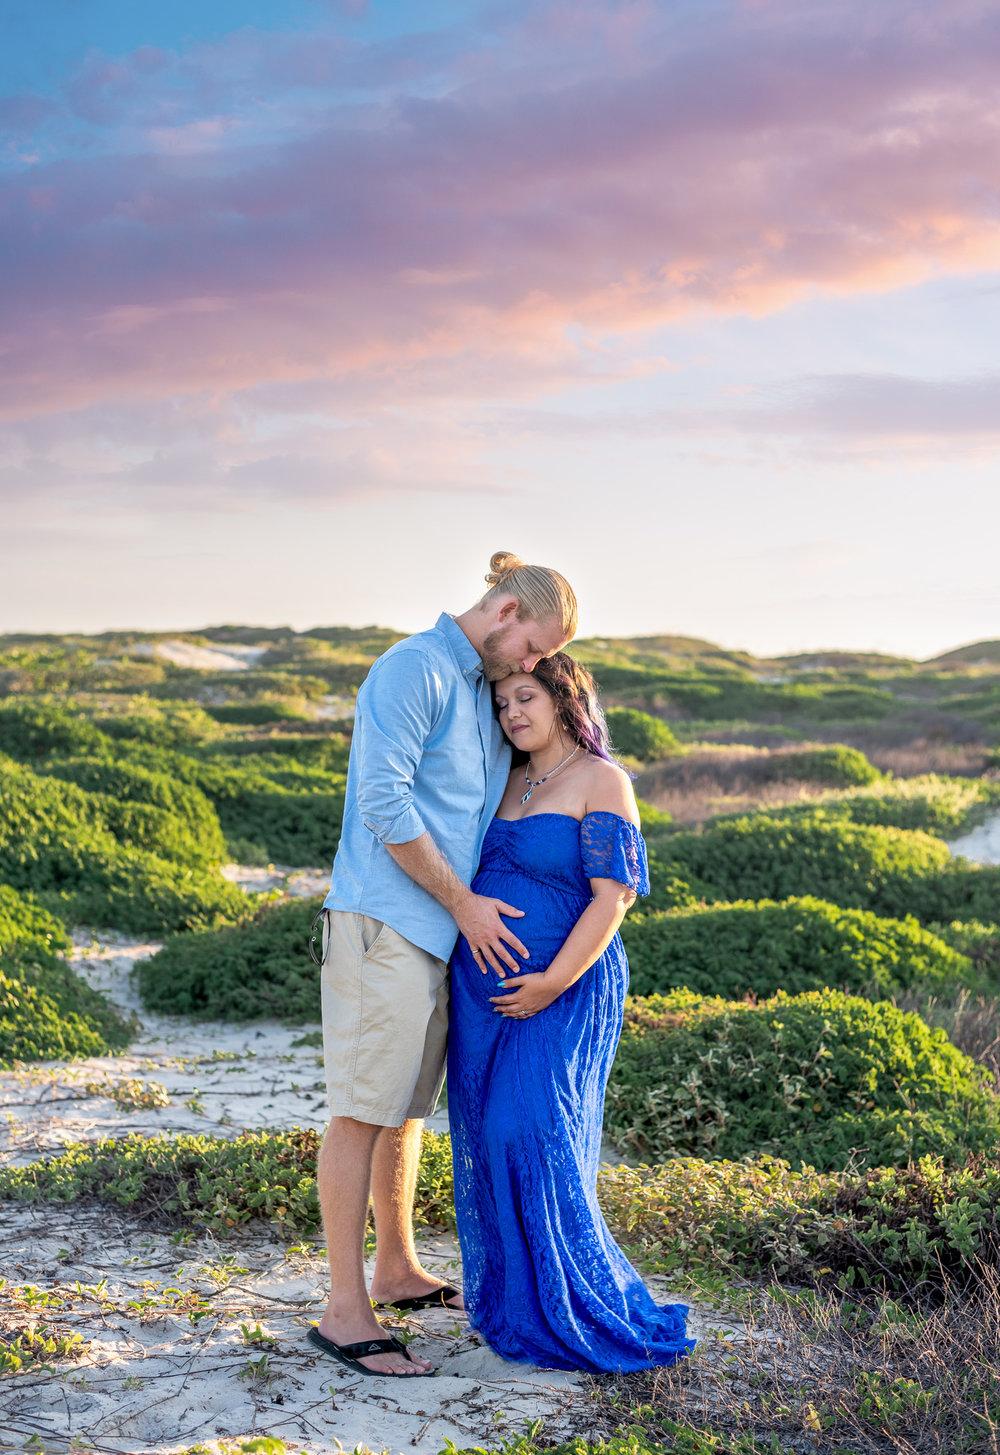 Corpus Christi Beach maternity photo